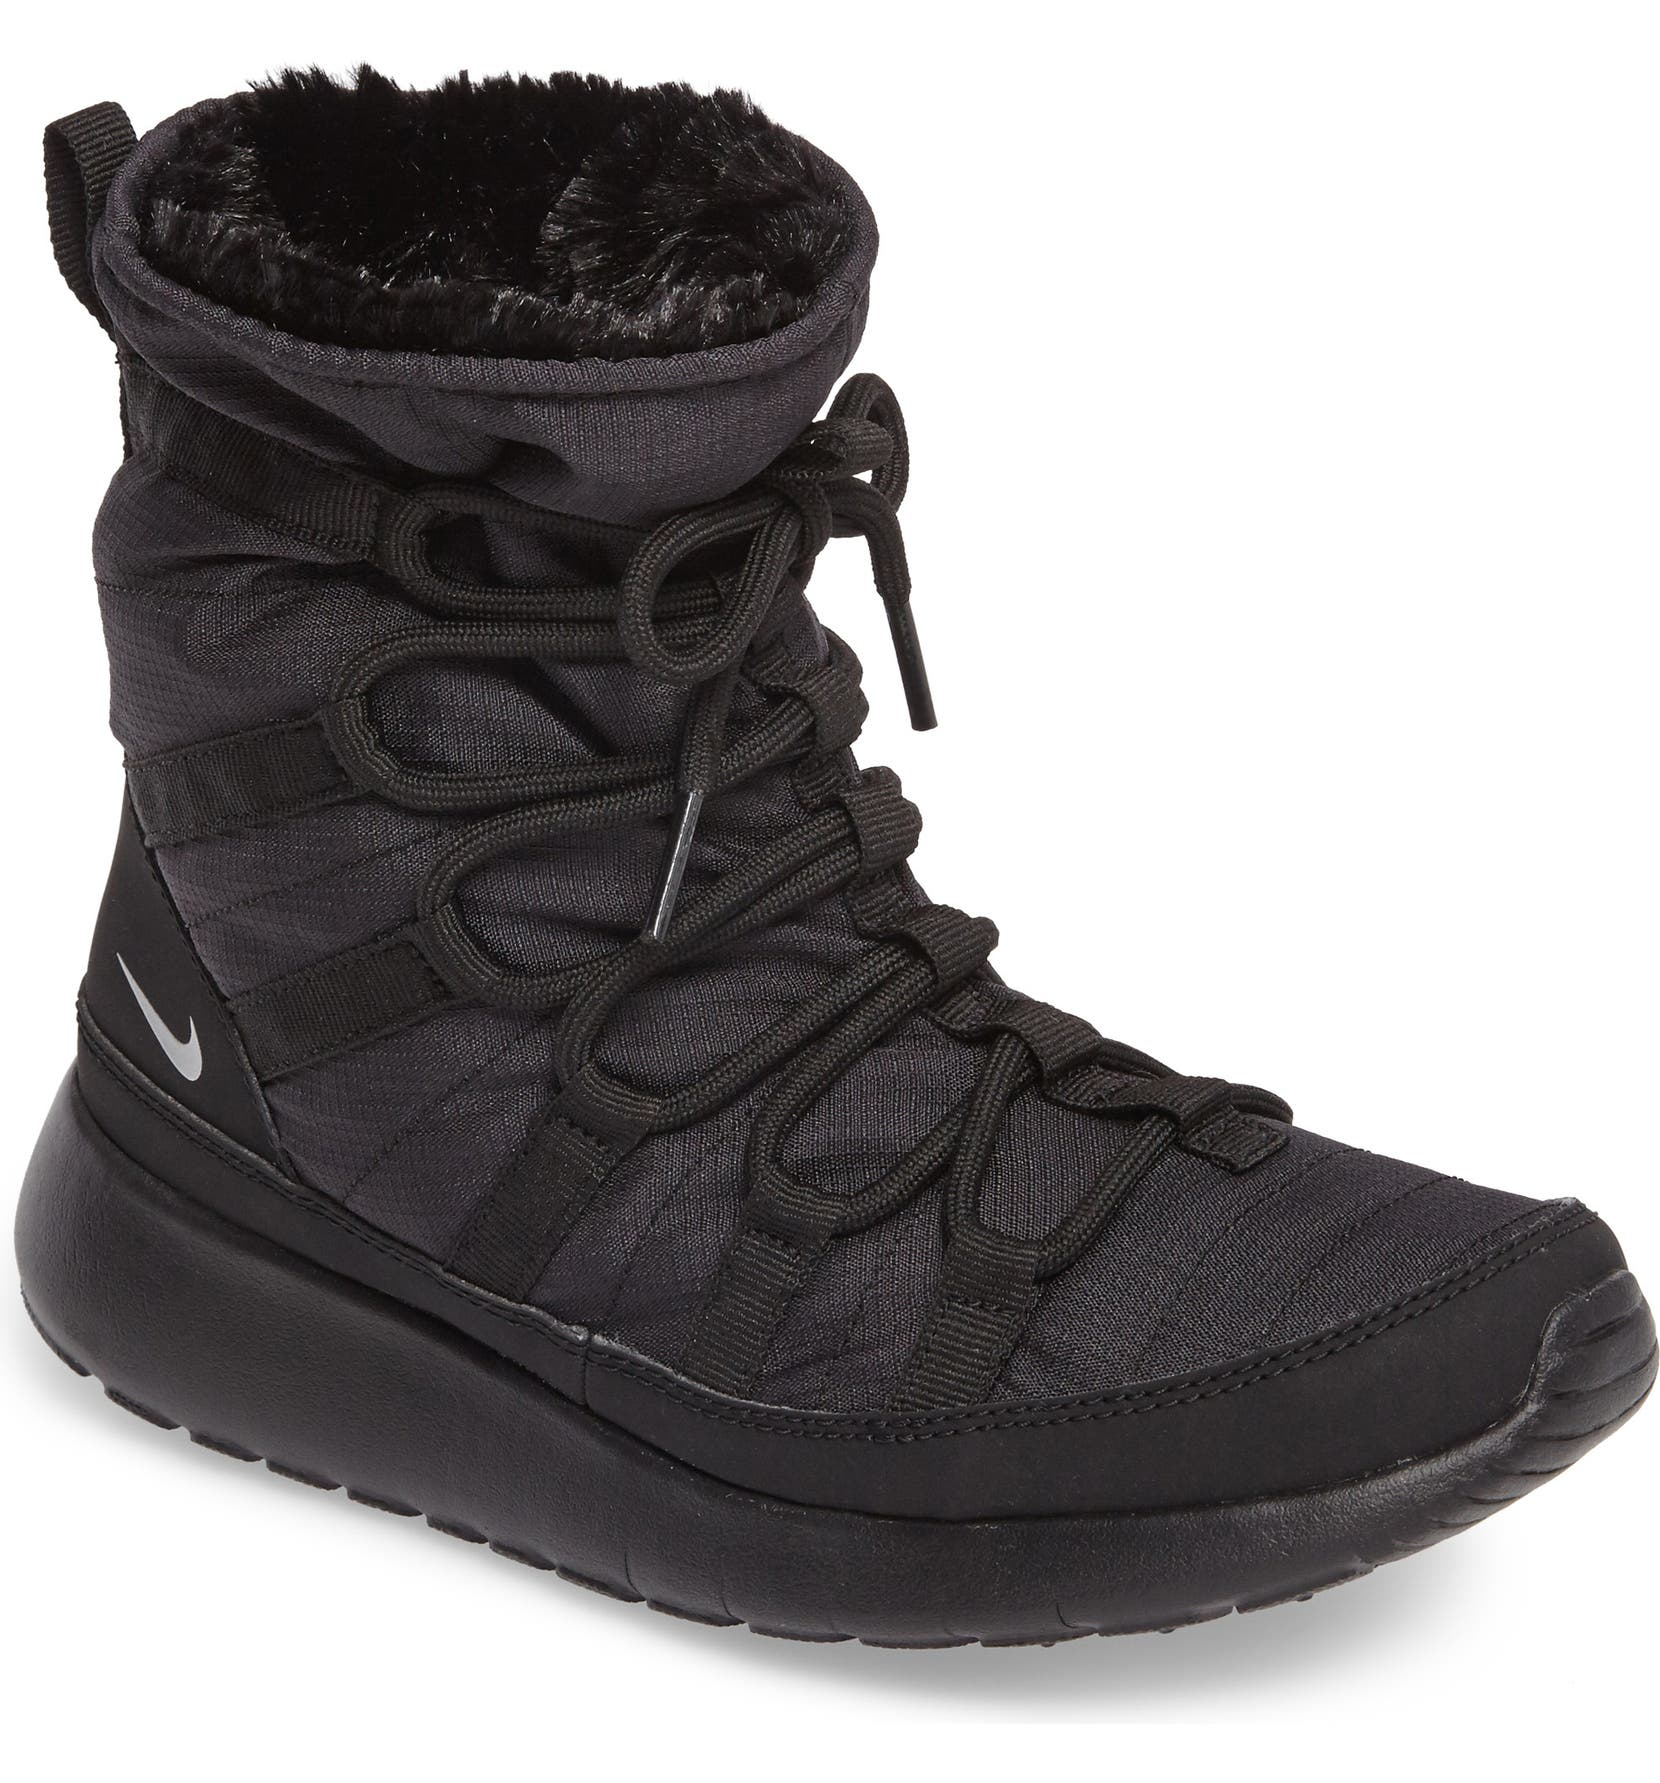 super popular 078aa a6321 'Roshe One Hi' Water Repellent Boot